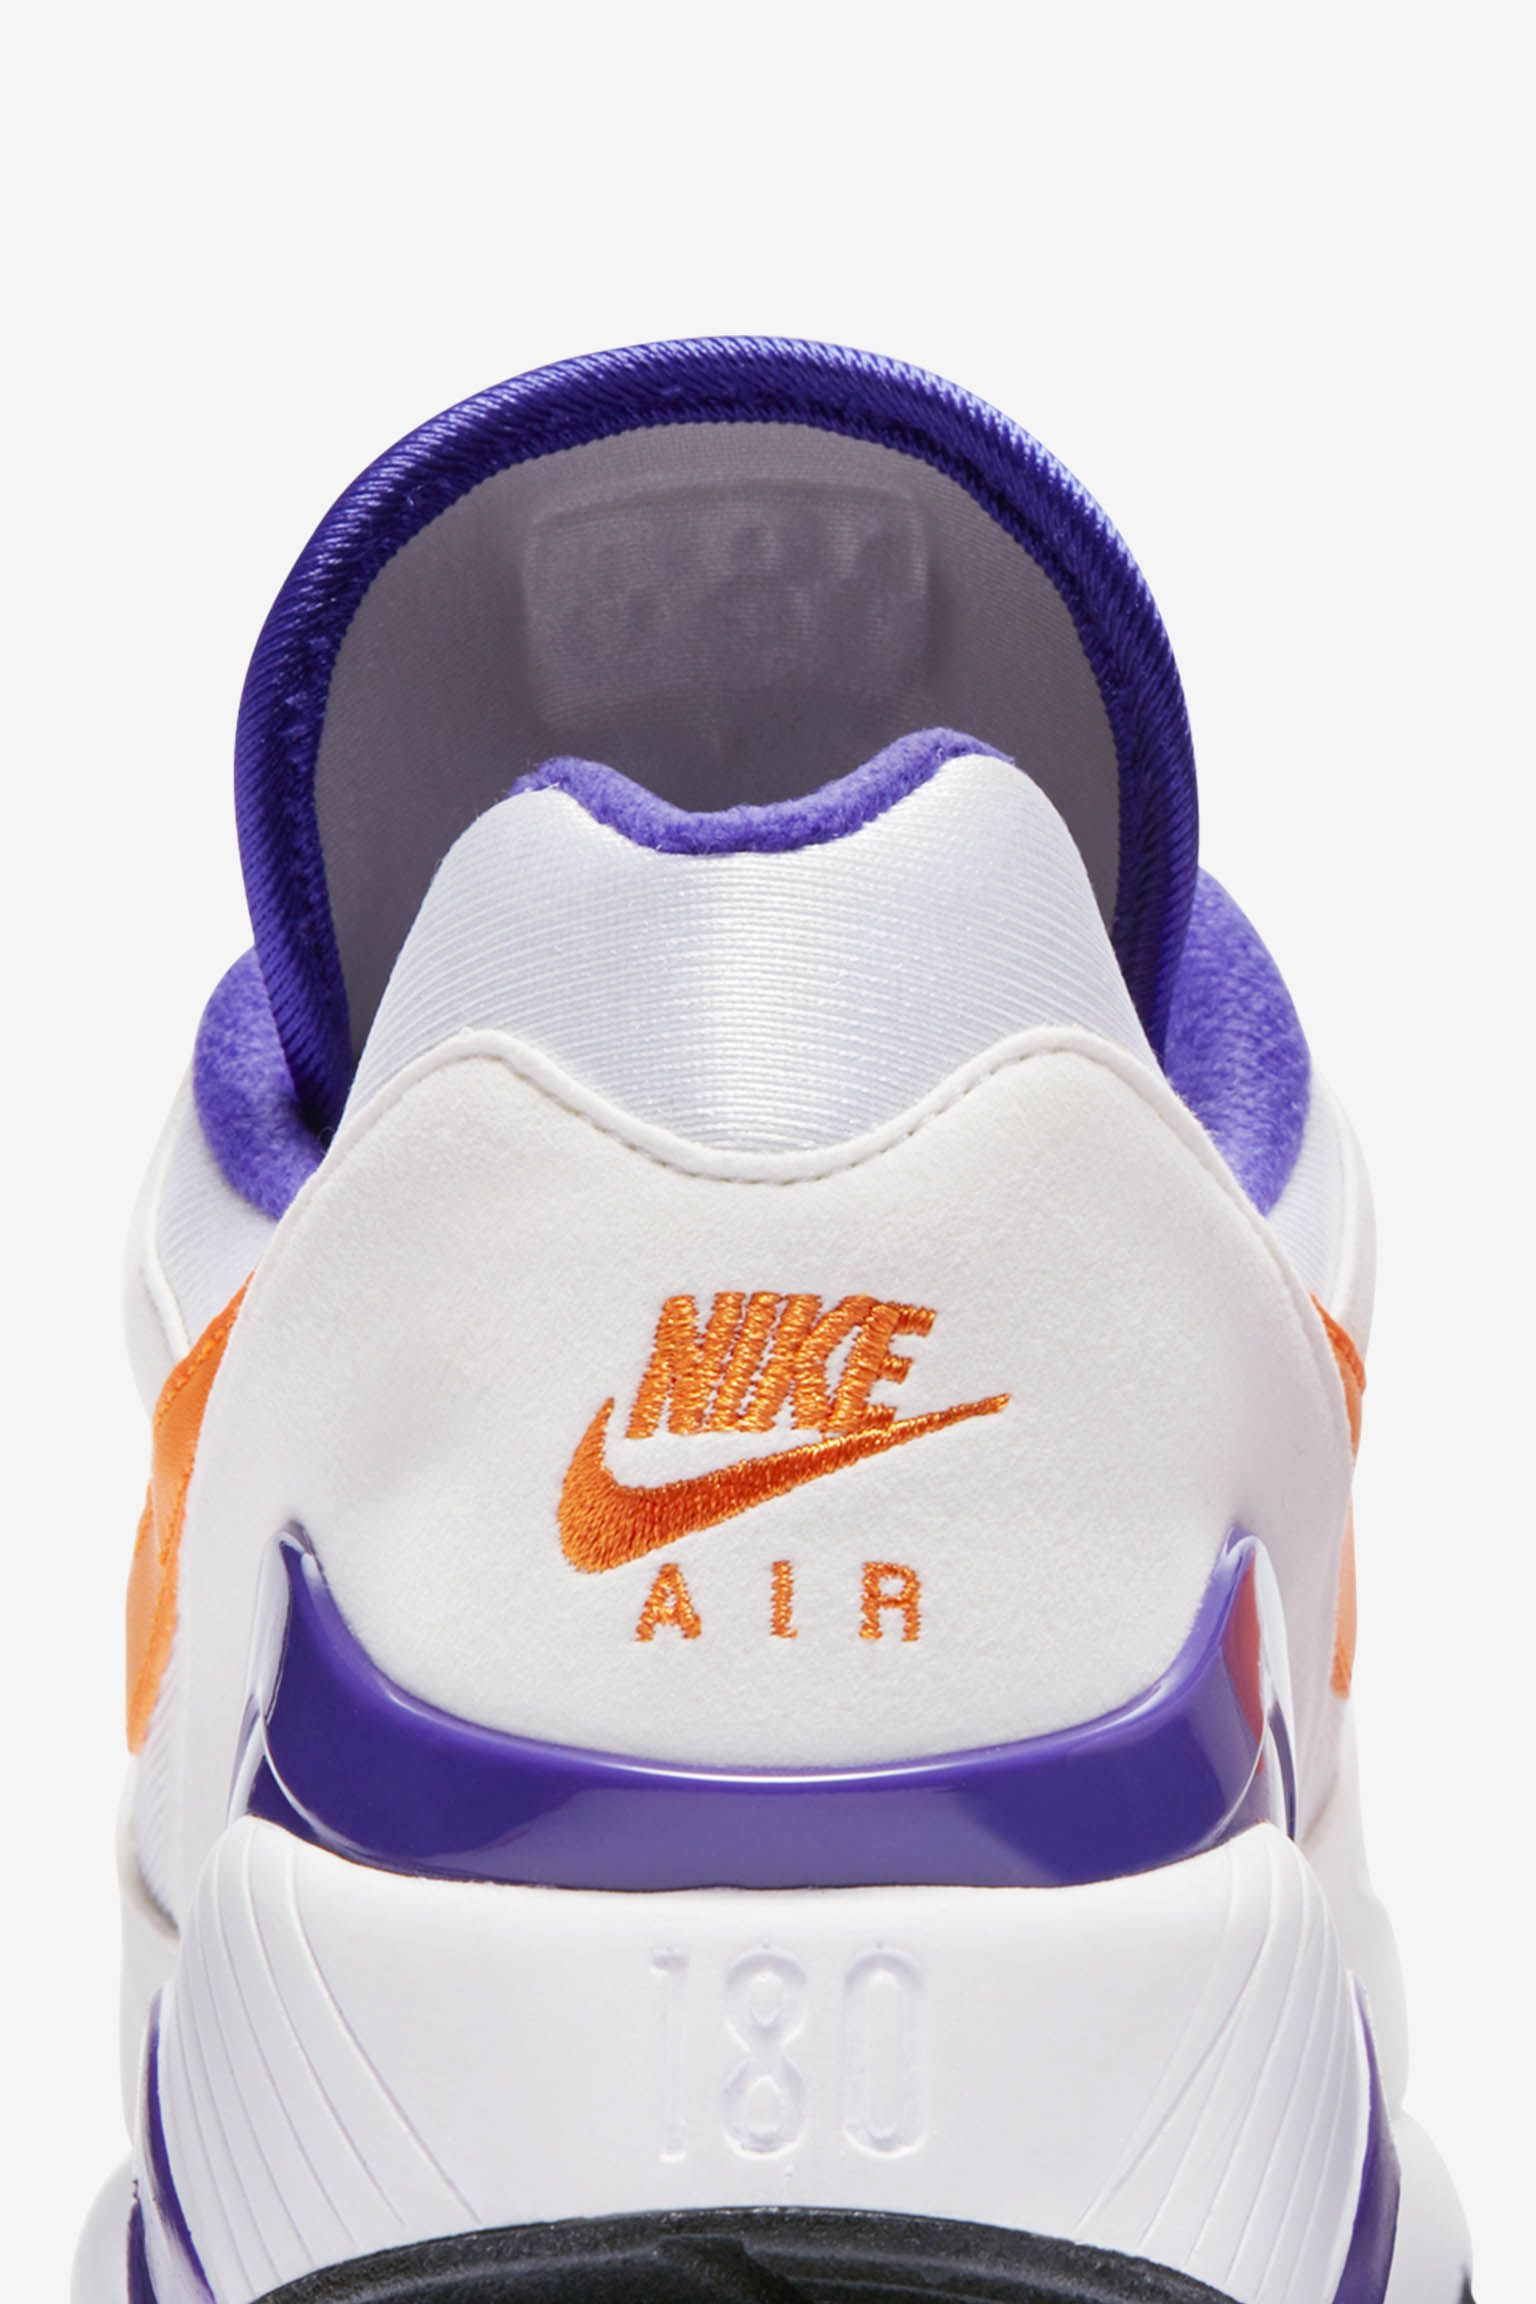 Date de sortie de la Nike Air Max 180 « Bright Ceramic & Dark ...